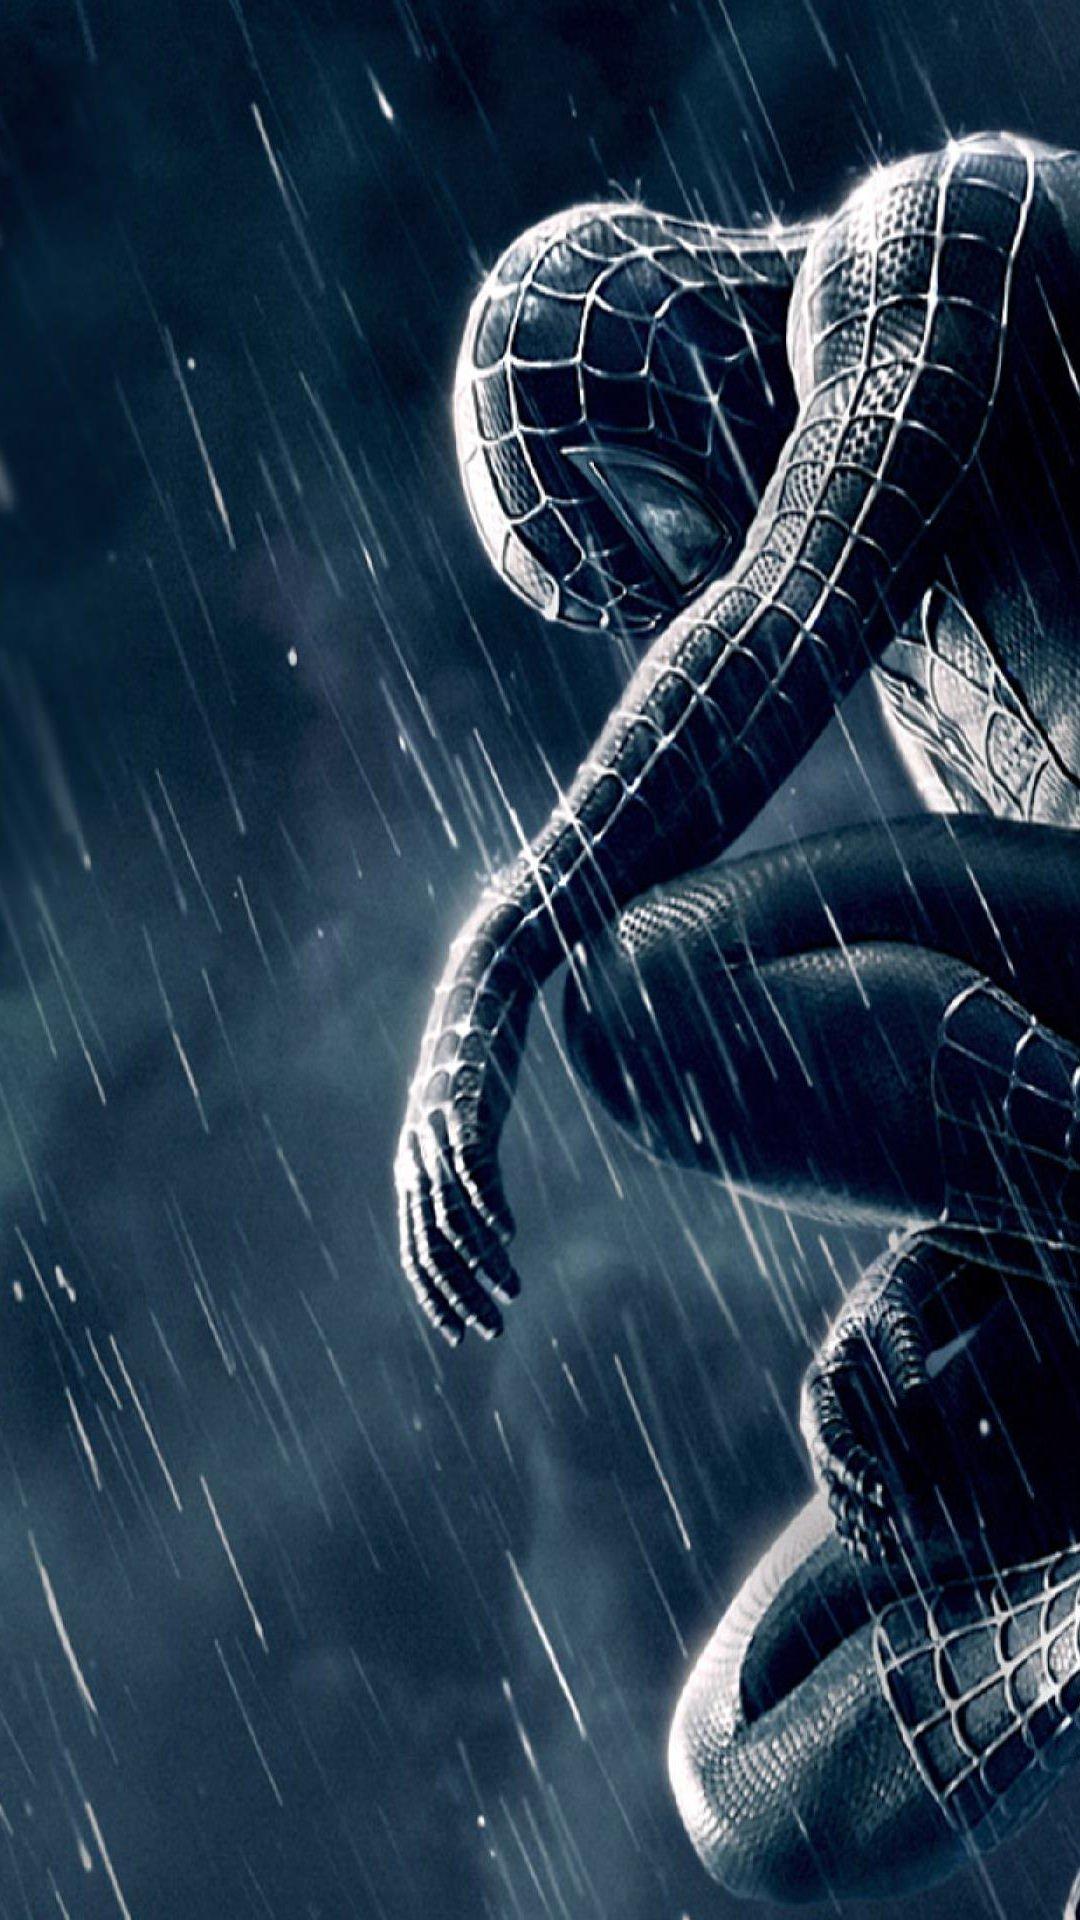 spiderman venom black rain illustration dark roof comics